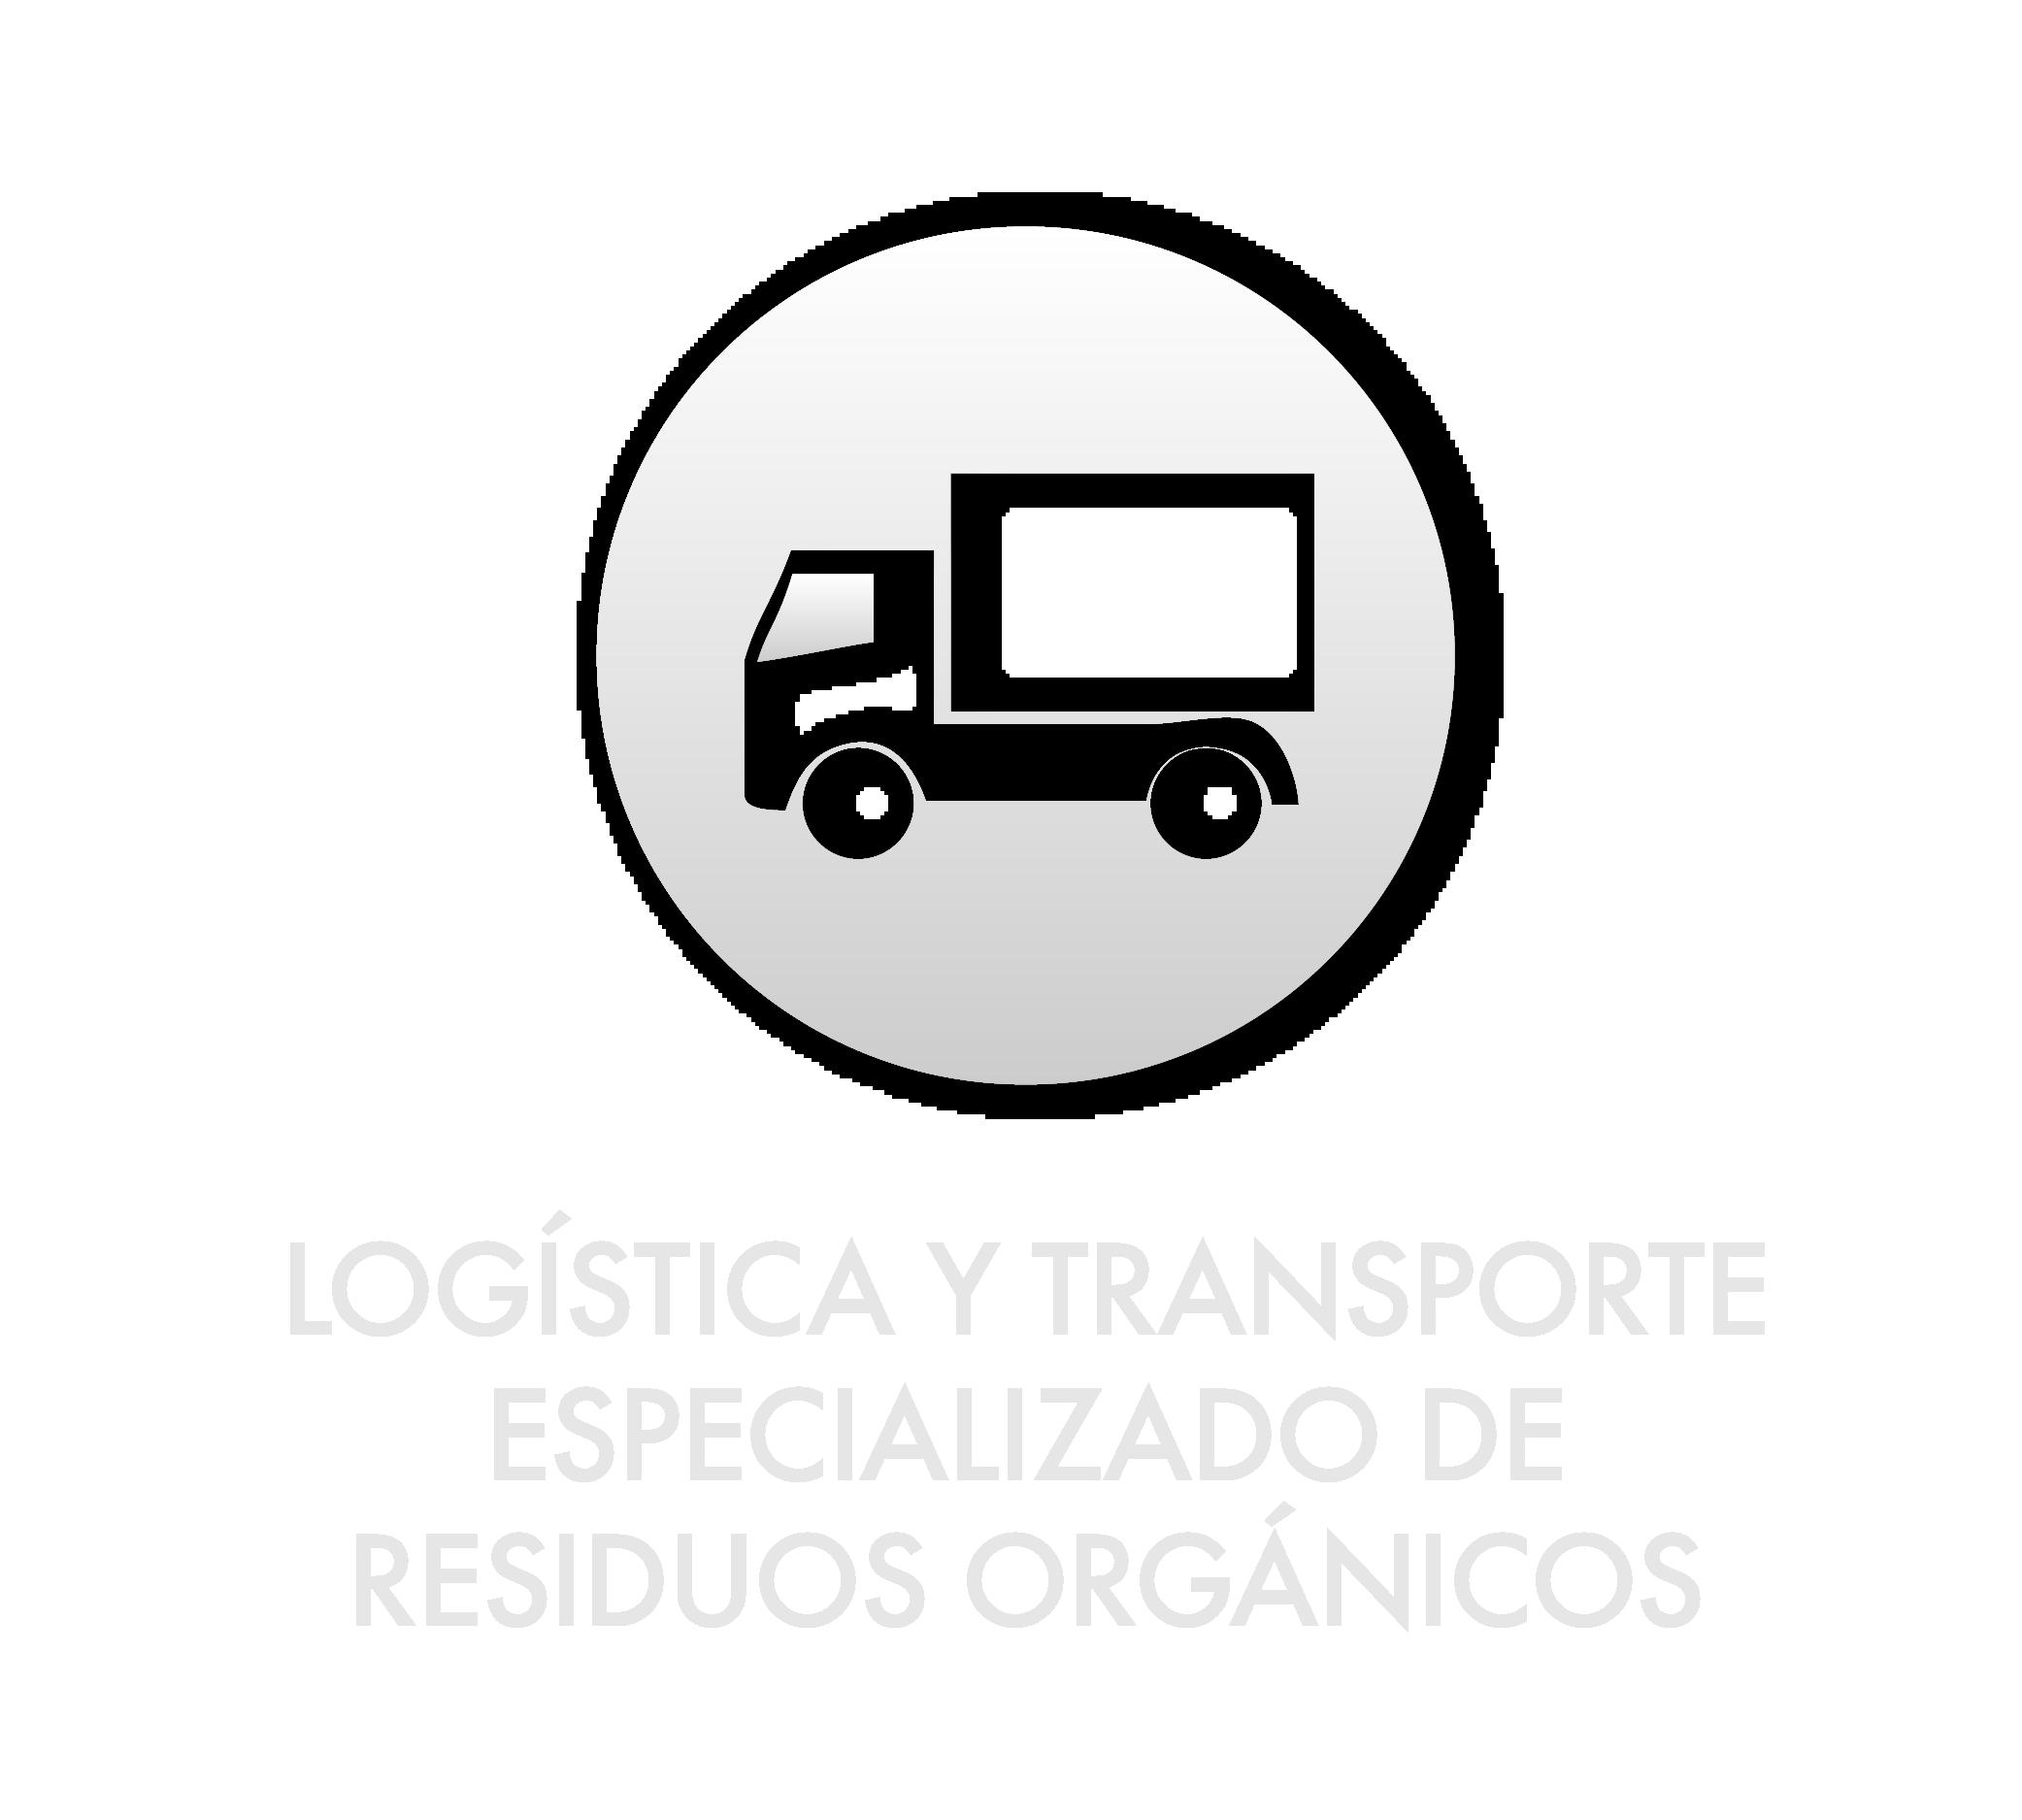 logistica y tranposte_v1-01